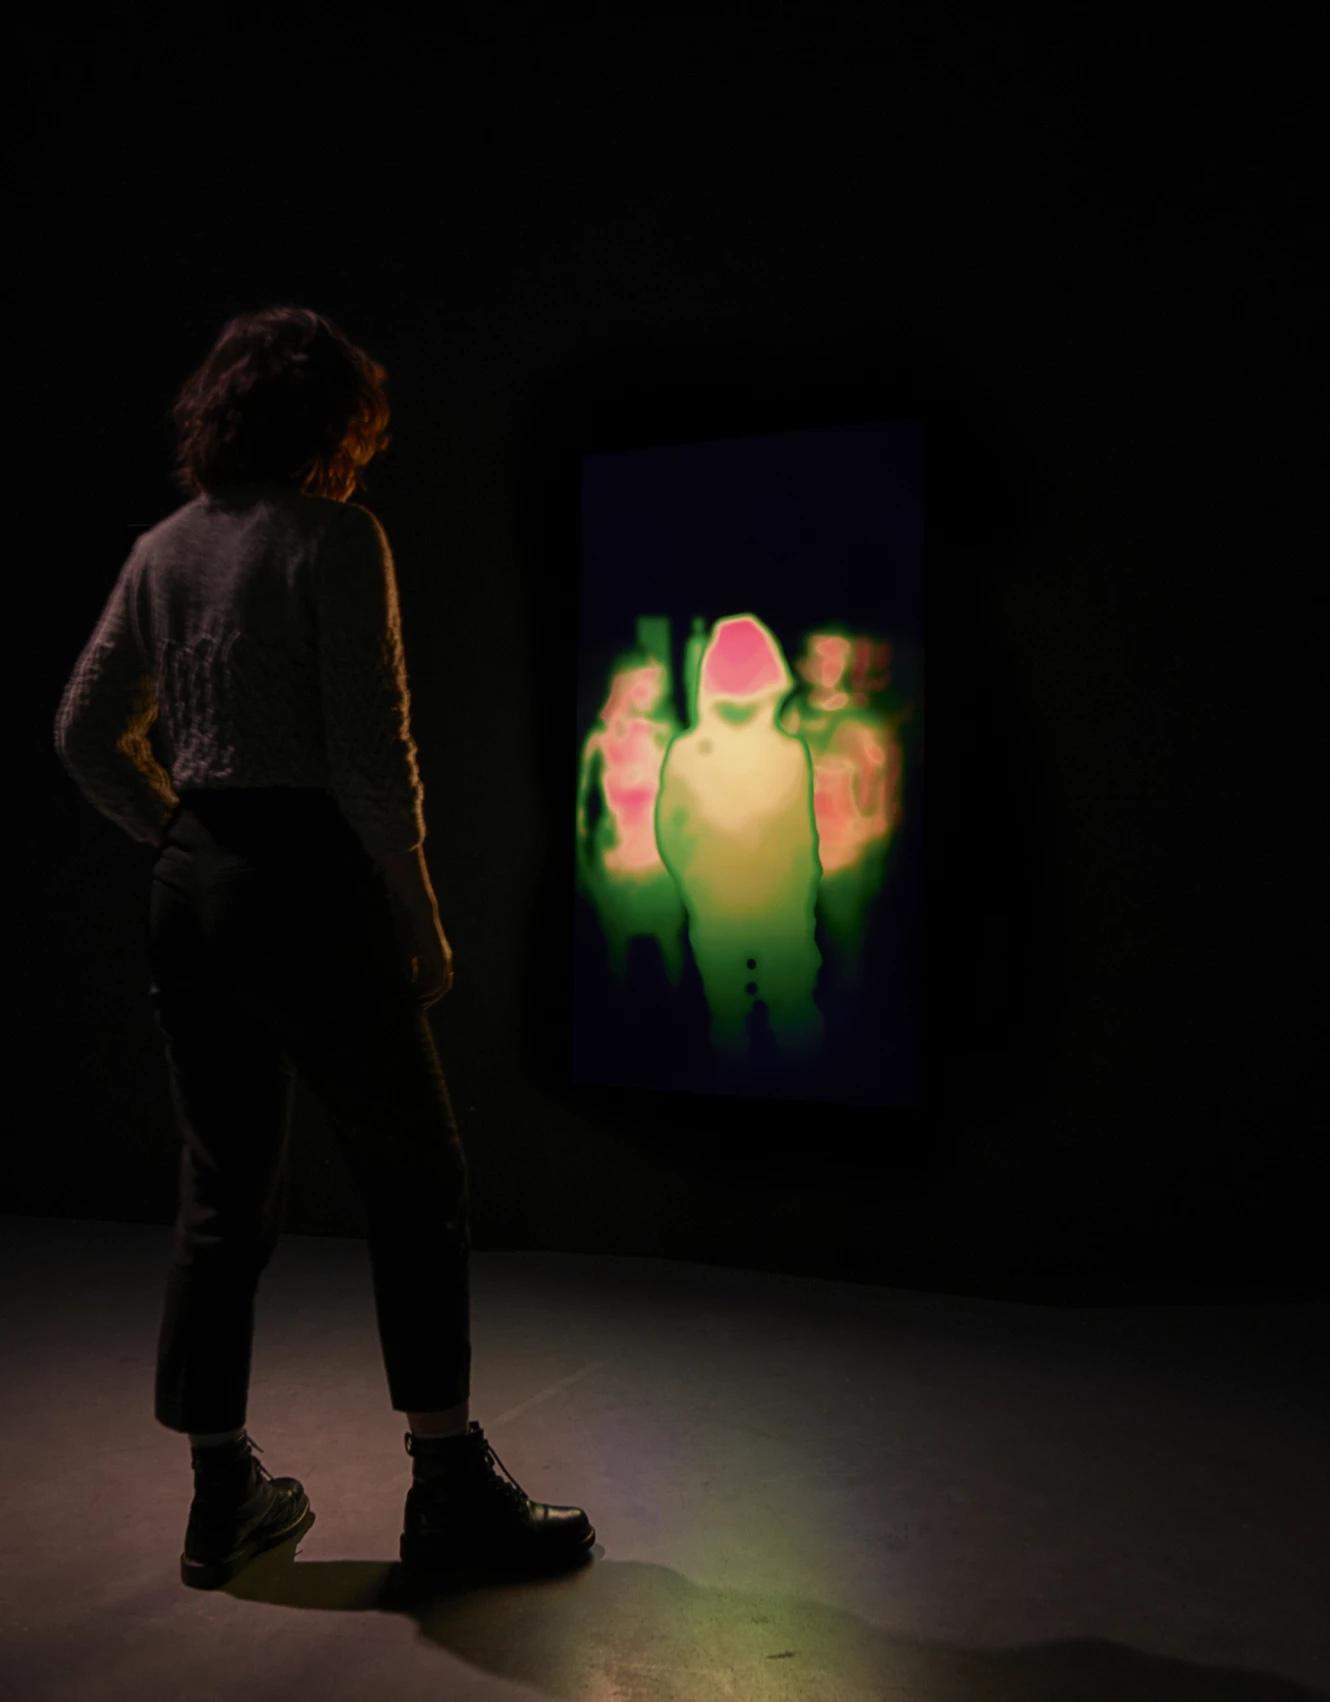 13-Lucrecia-Martel-Vive-le-cinéma_2021_-Eye-Filmmuseum-©-Studio-Hans-Wilschut-119